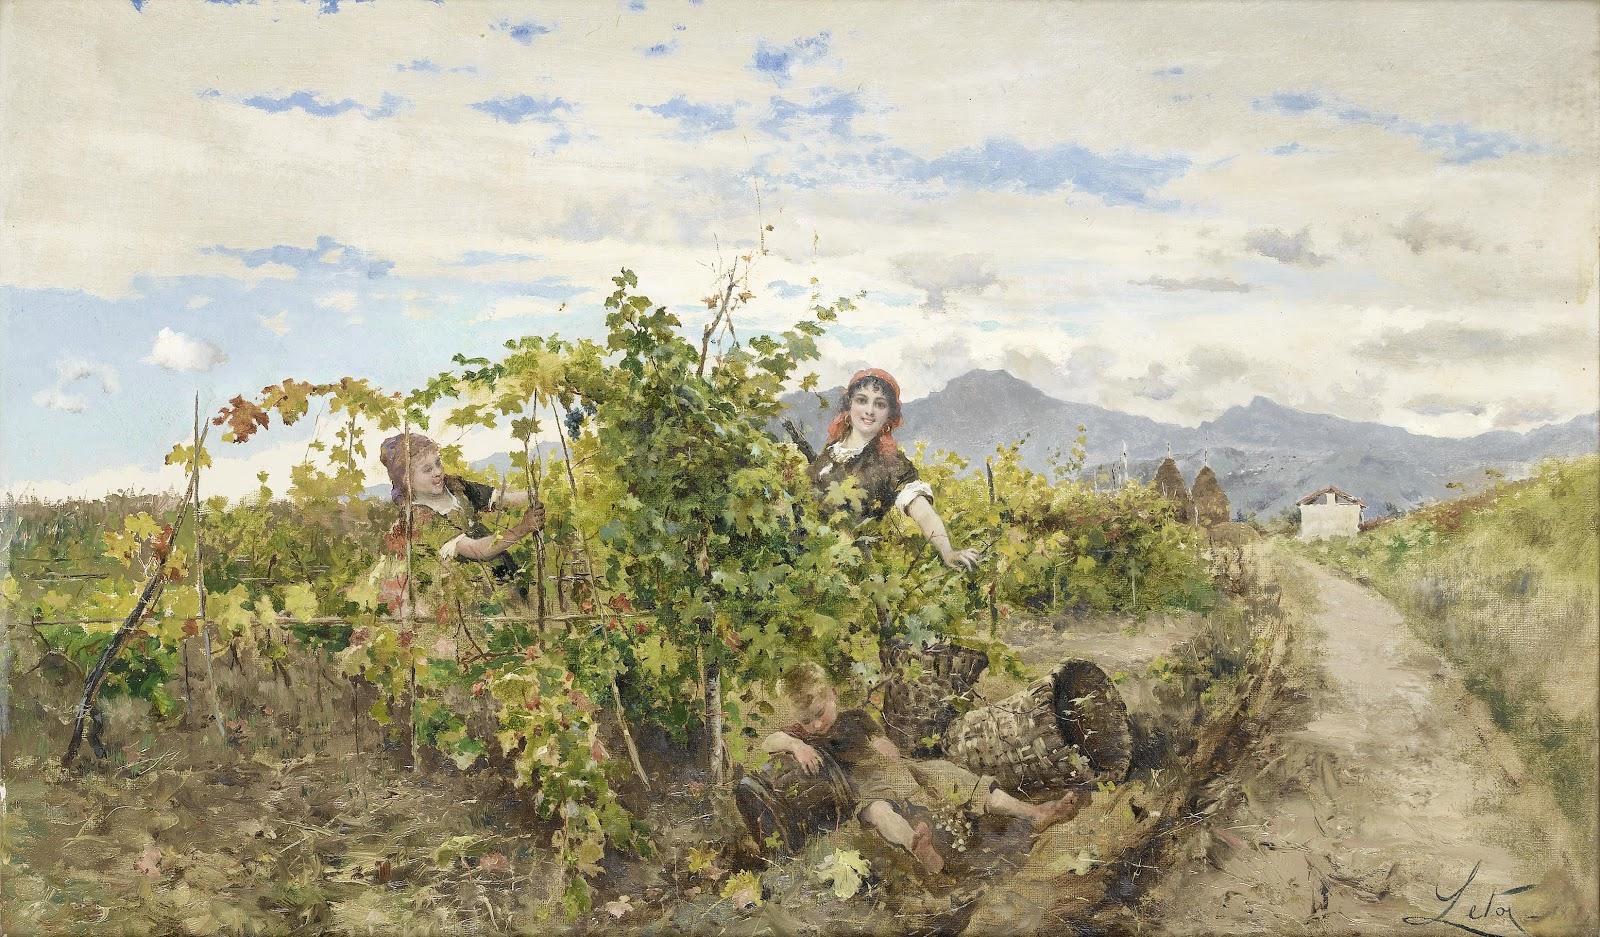 Antonino Leto Ragazze raccolta uva